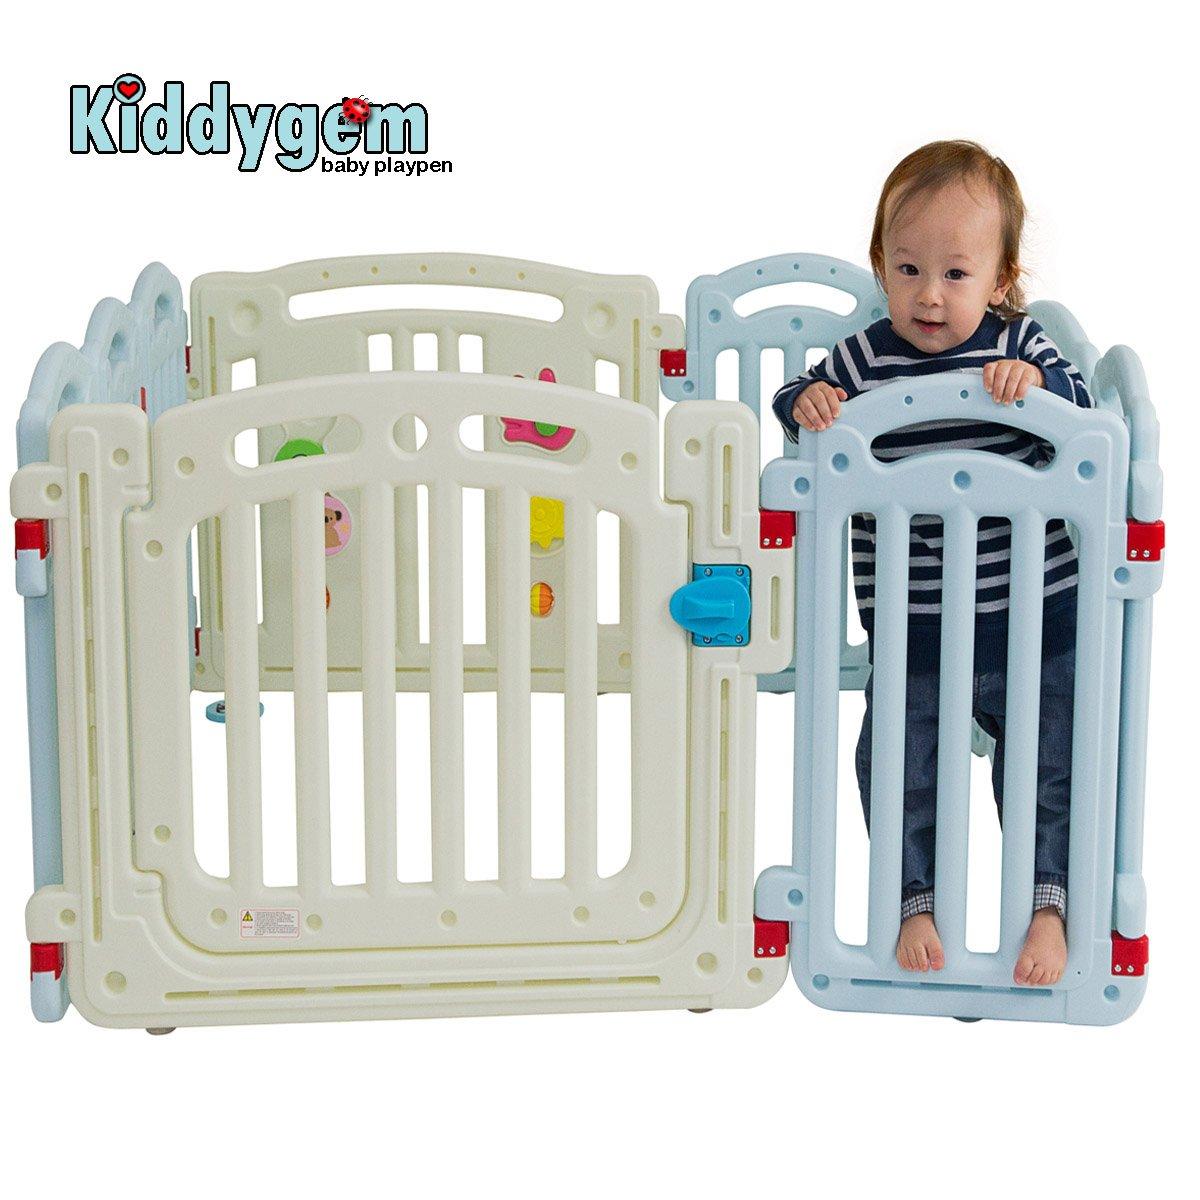 Kiddygem M7 Extra Tall Baby Playpen, Blue